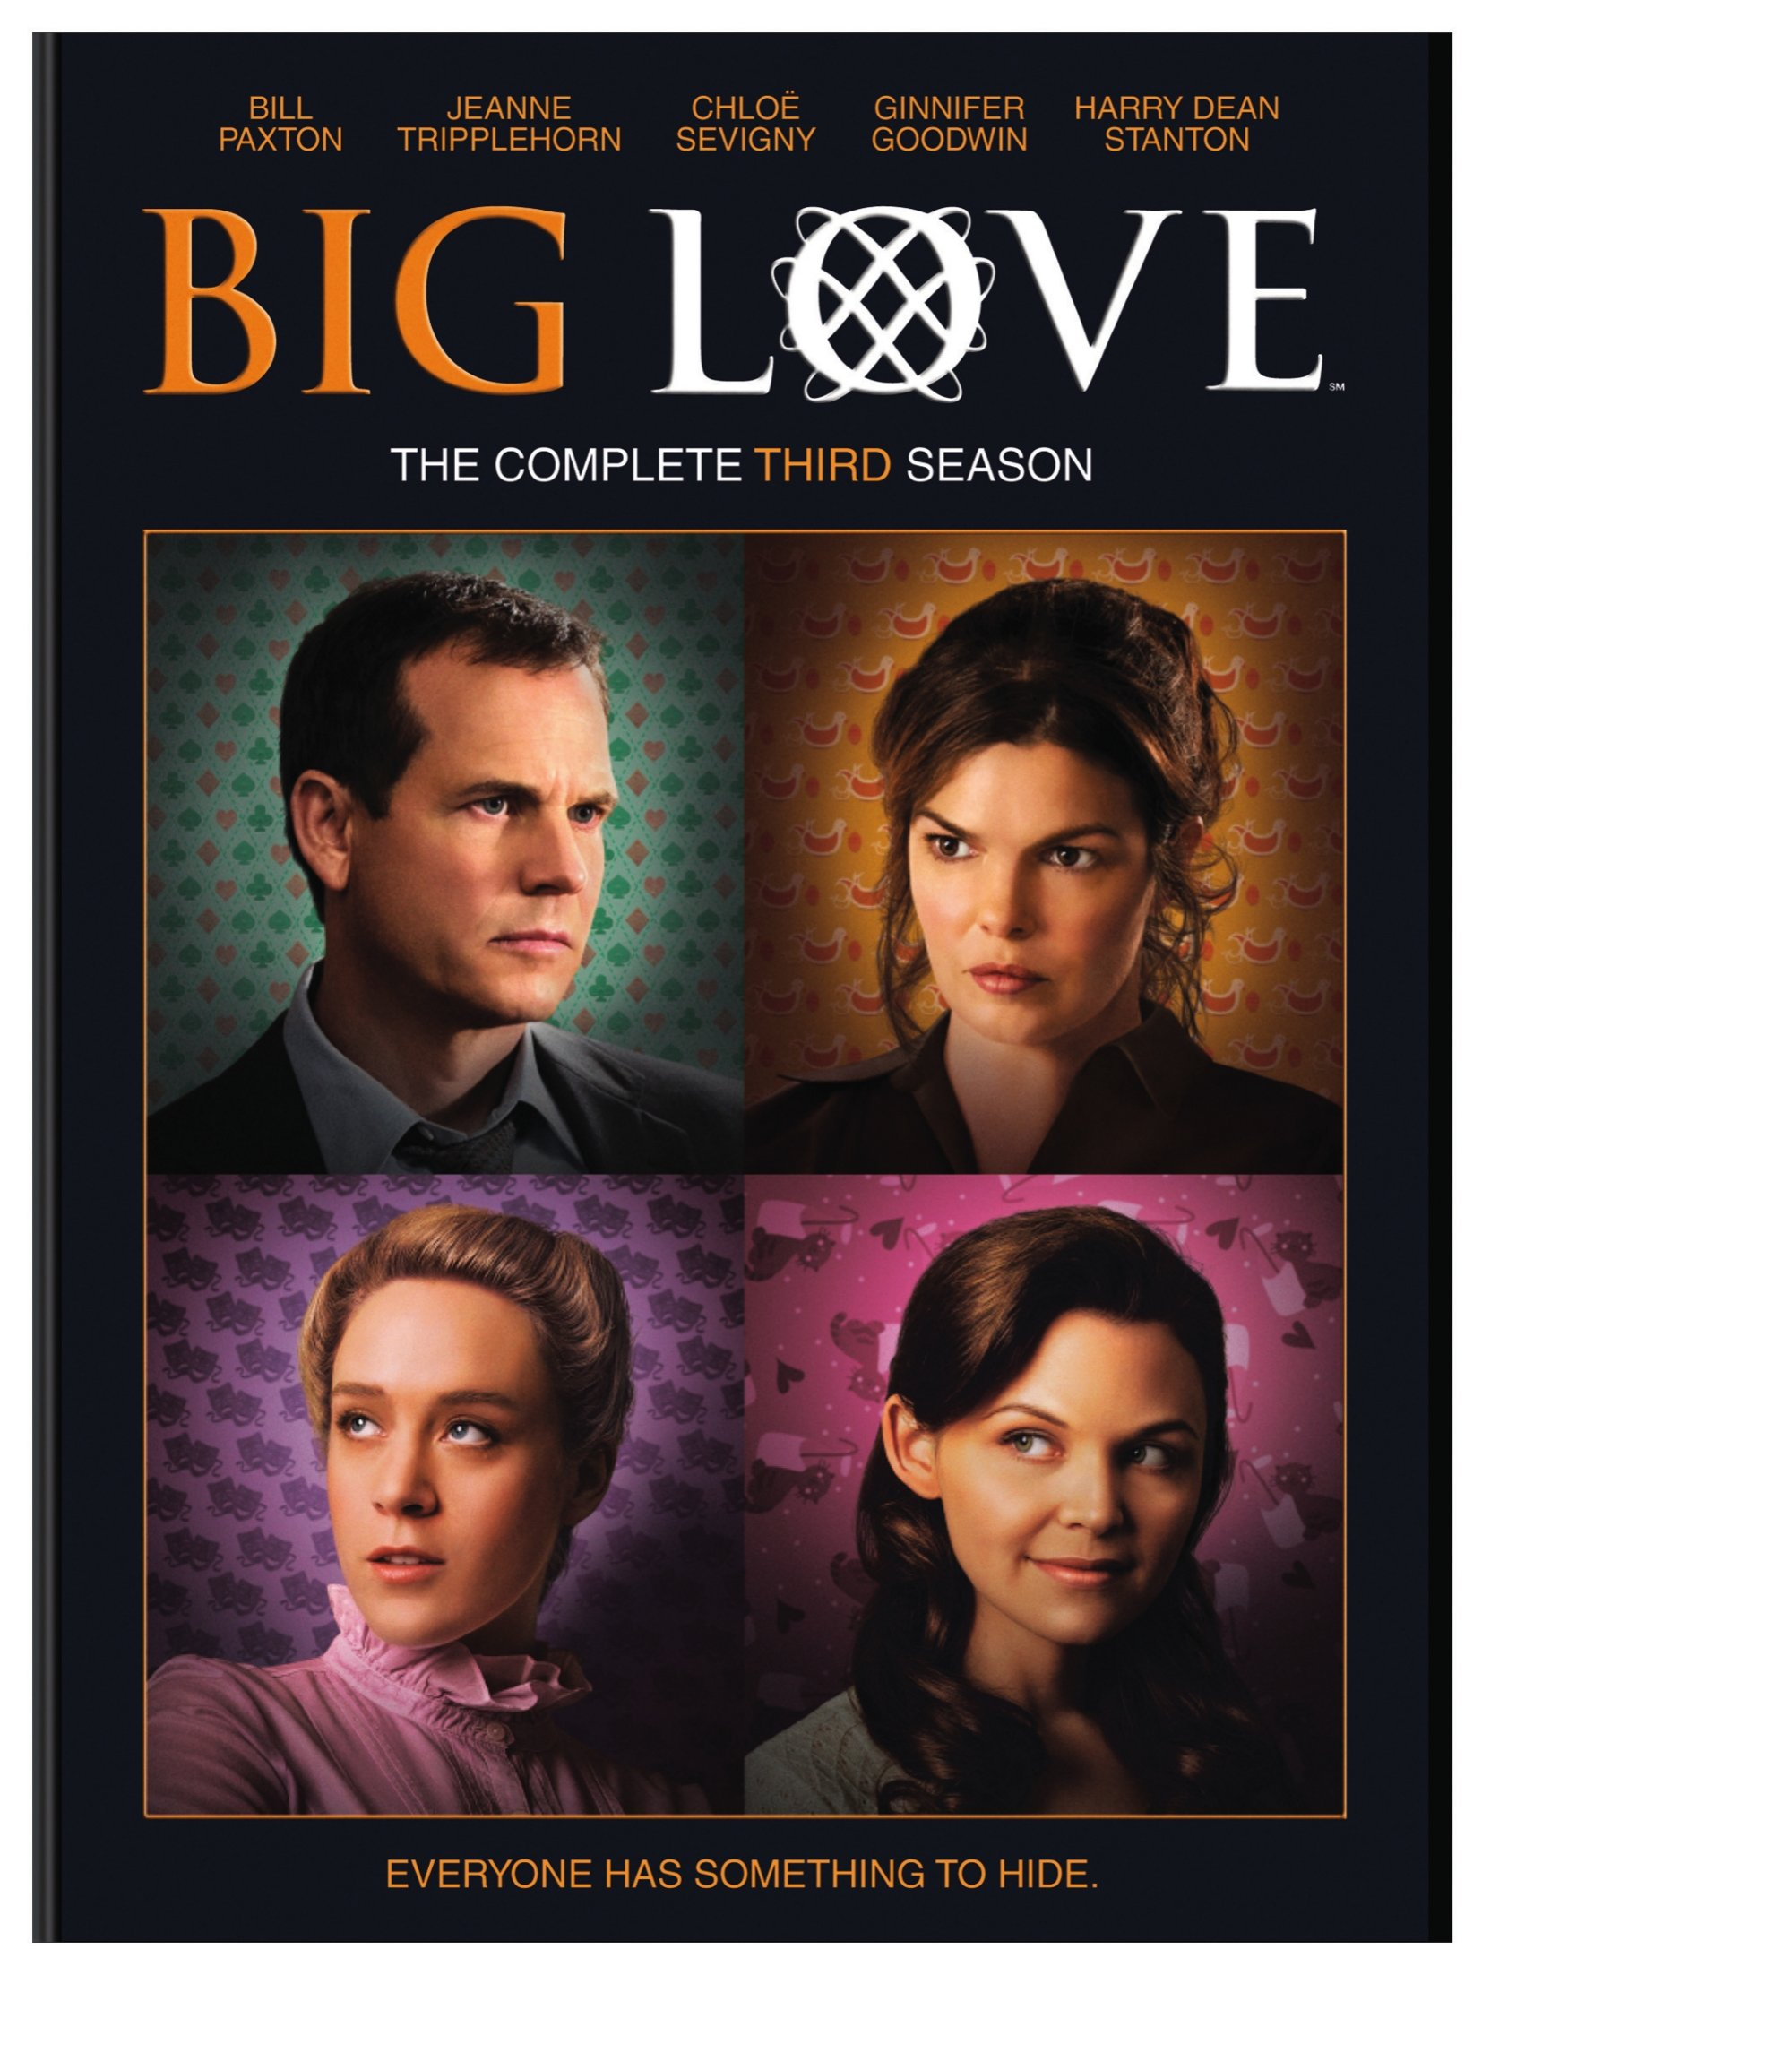 Big Love: The Complete Third Season (DVD)